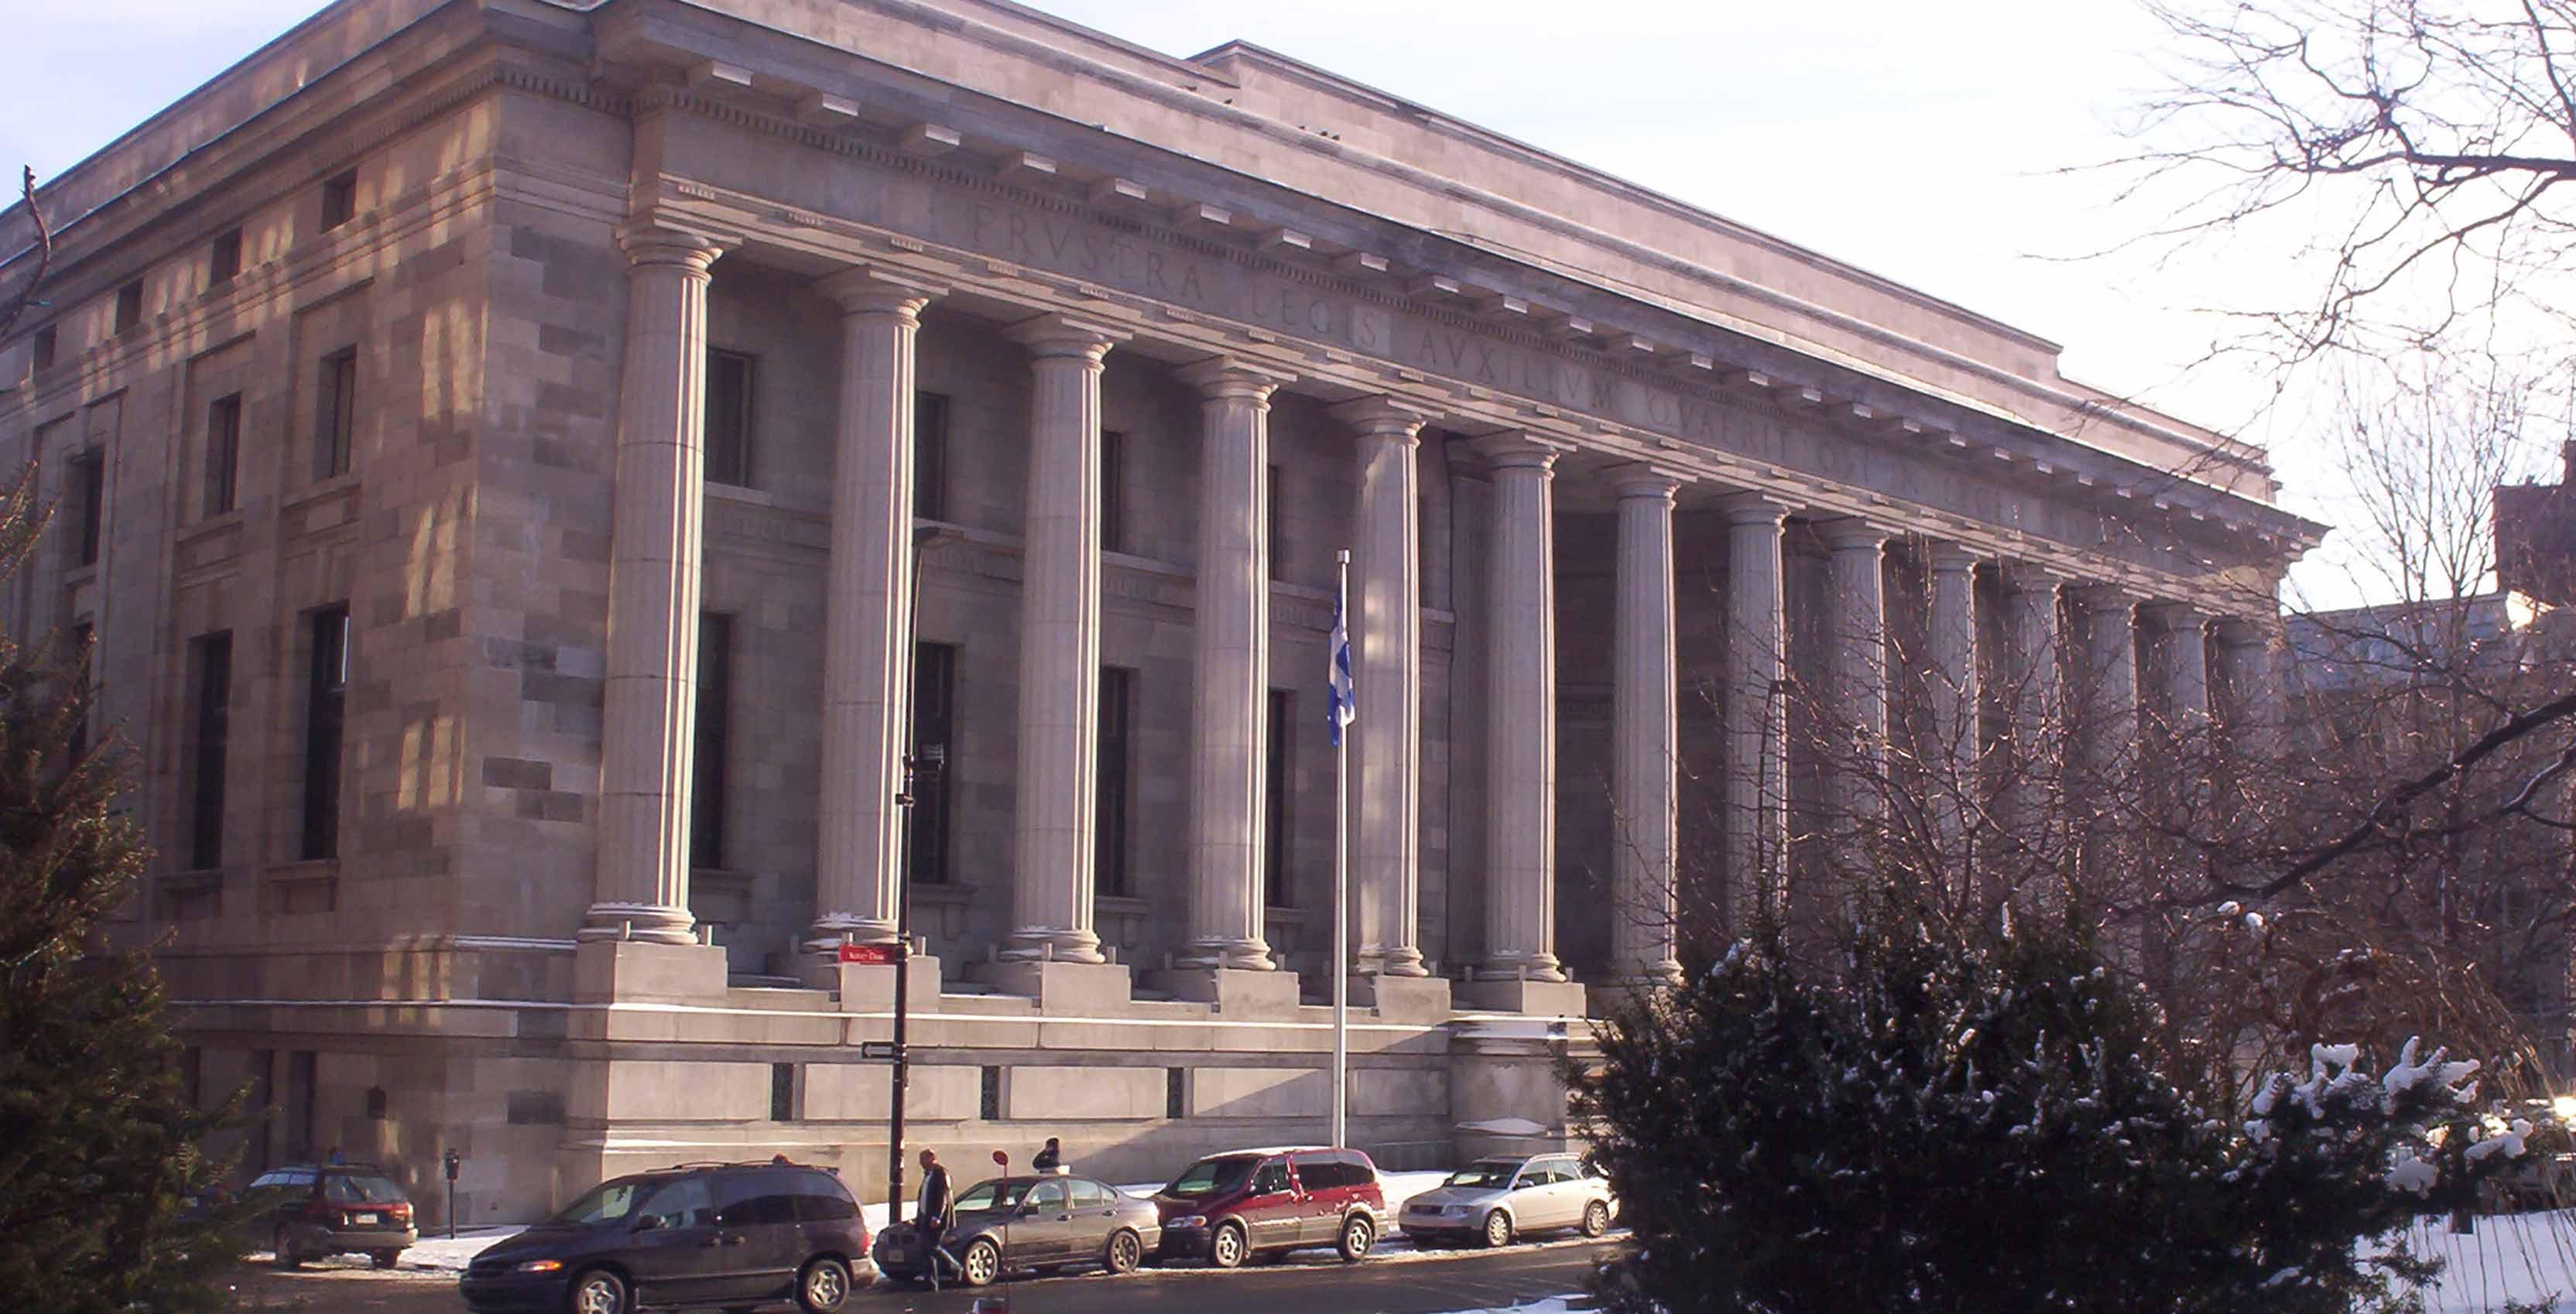 Quebec Court front